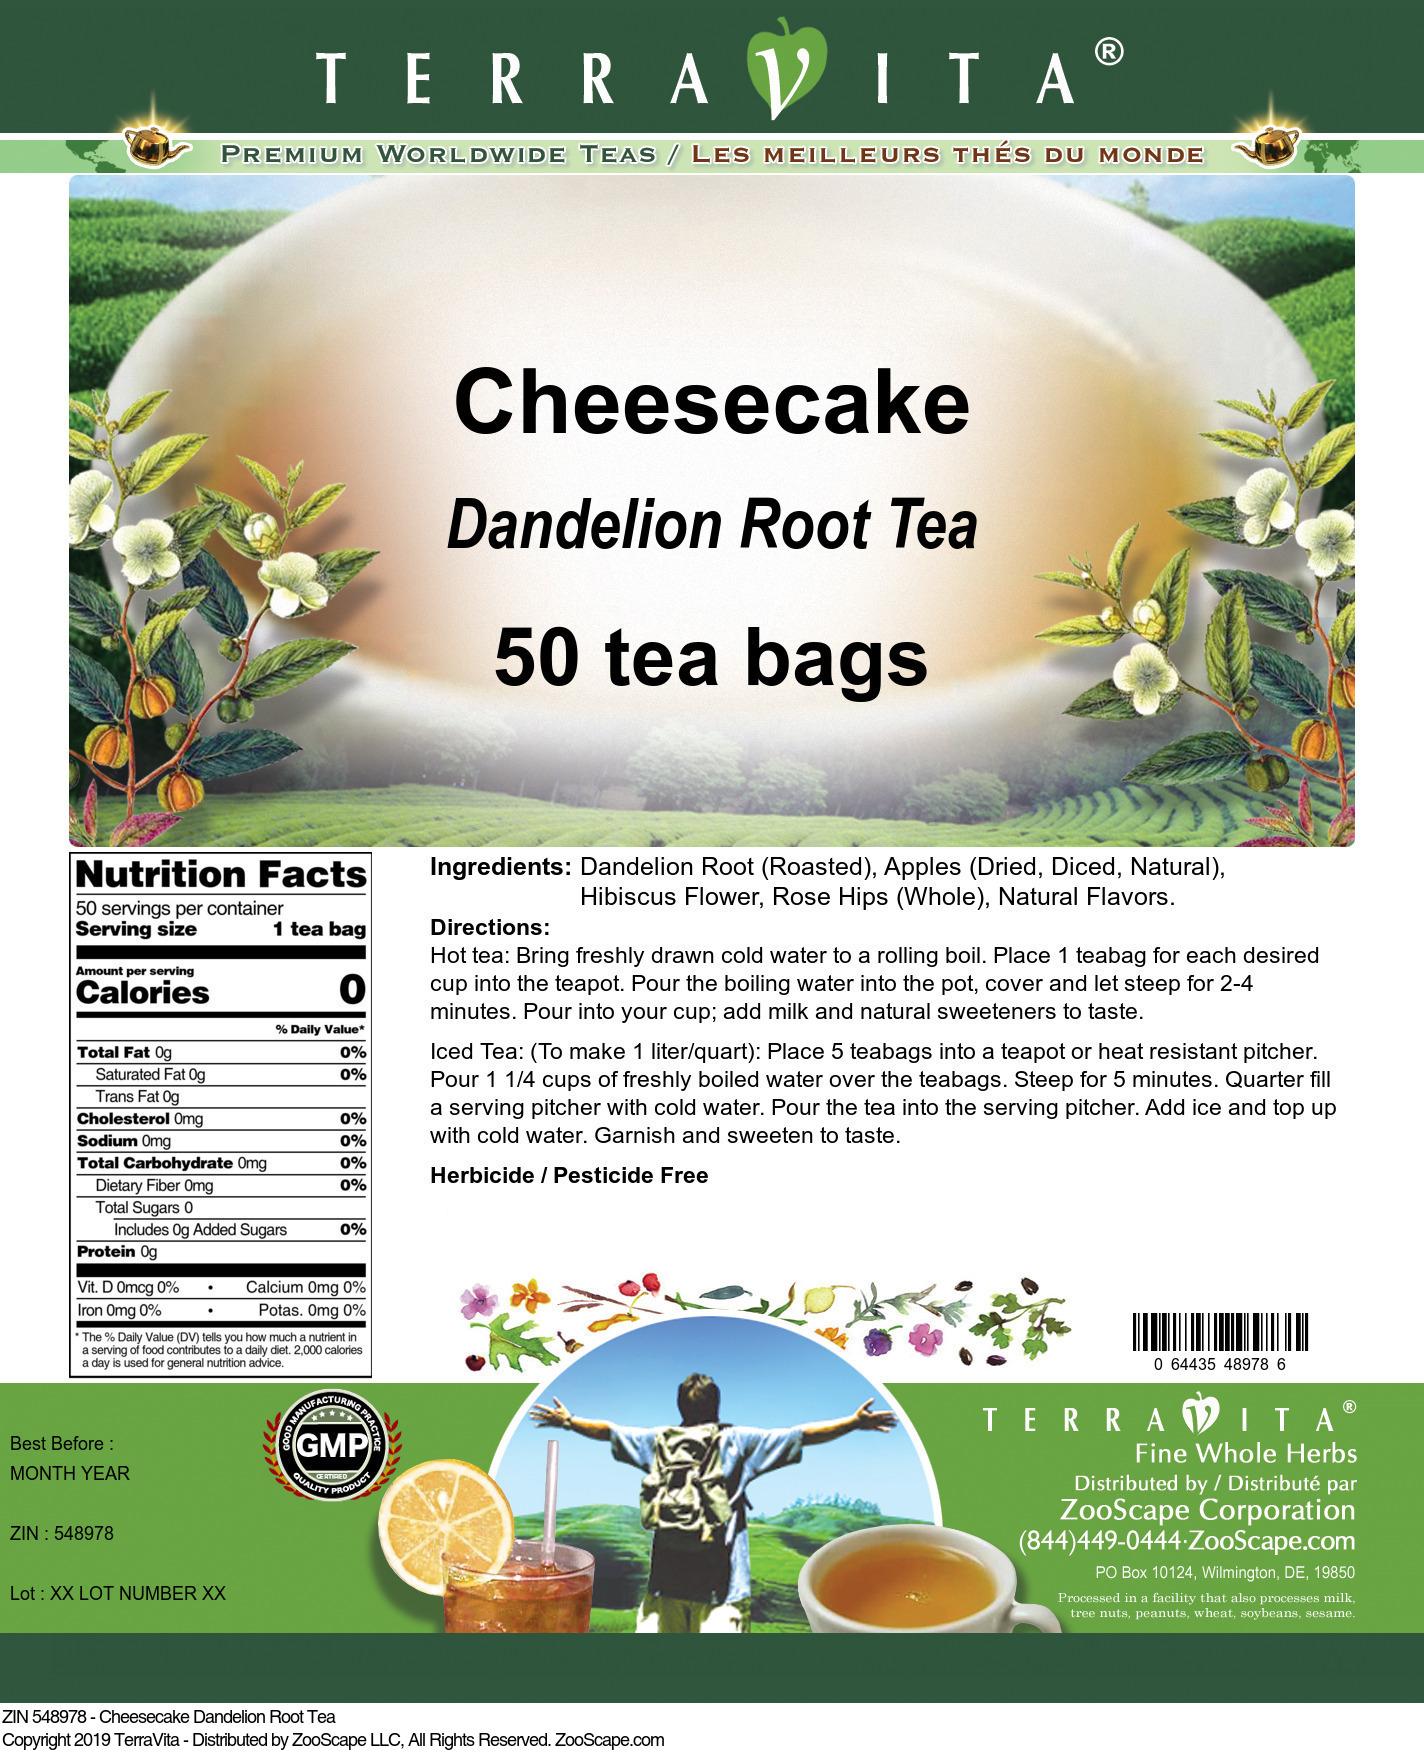 Cheesecake Dandelion Root Tea